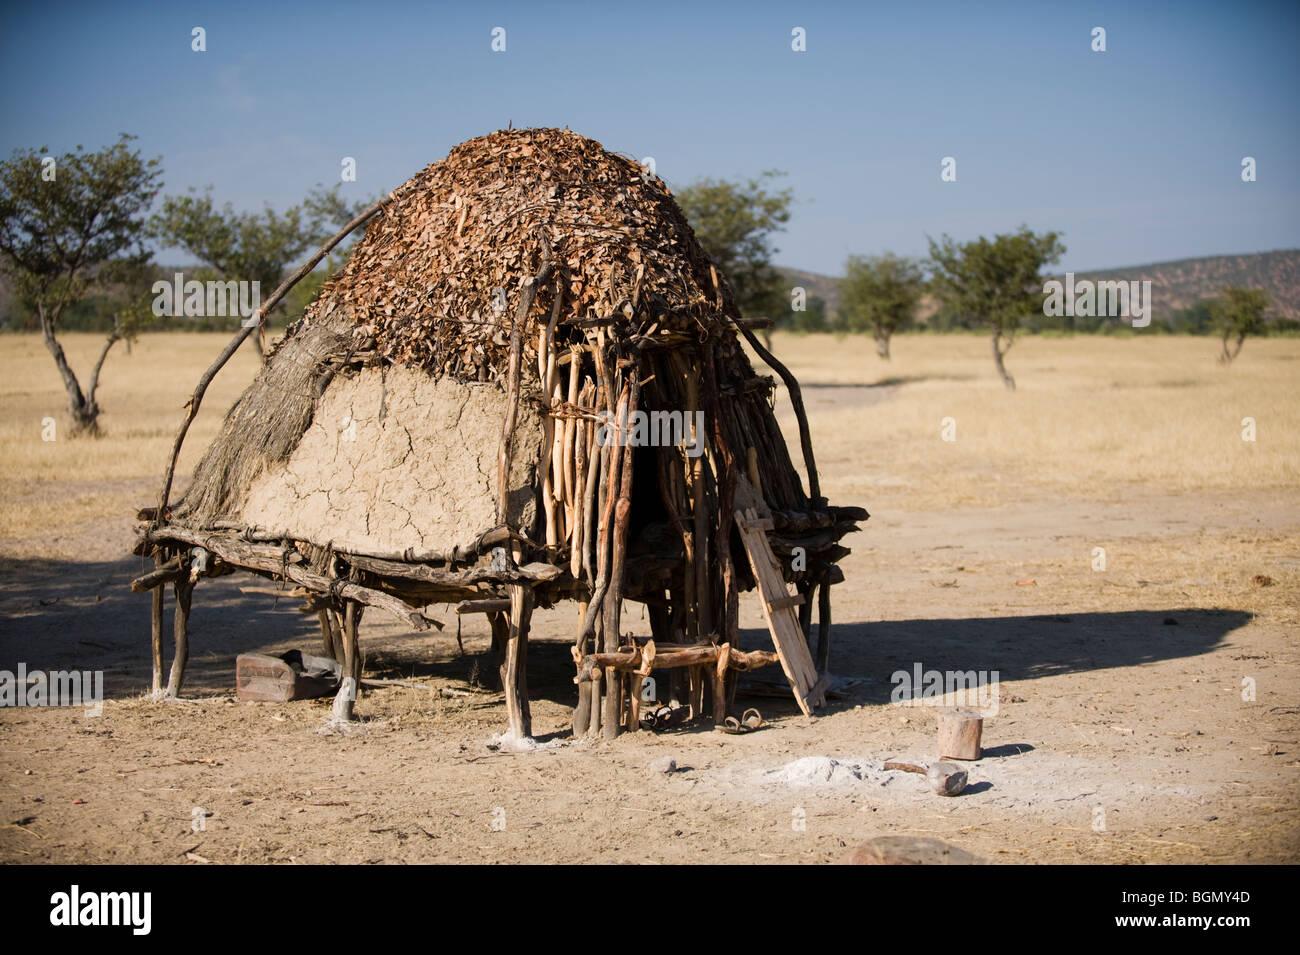 Himba village storage huts kaokoland, namibia - Stock Image